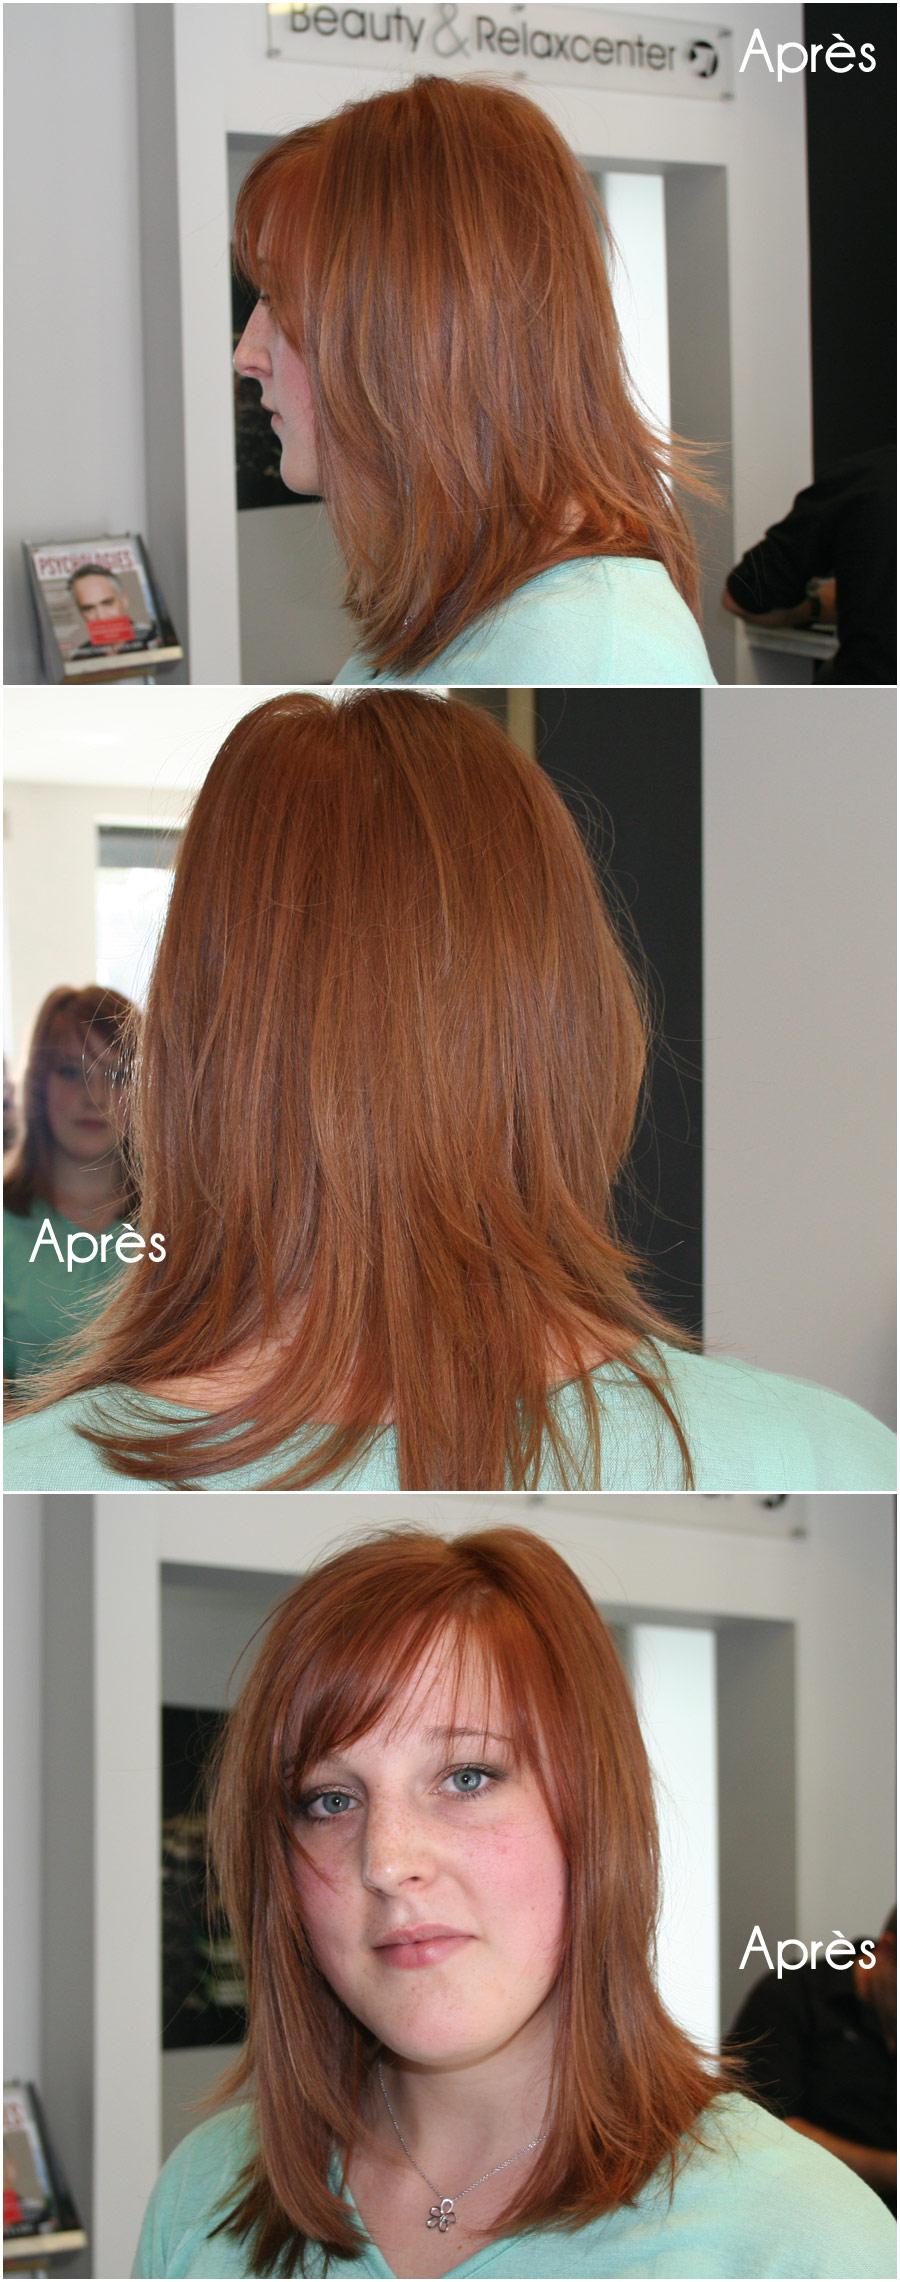 chromatics aprs - Redken Coloration